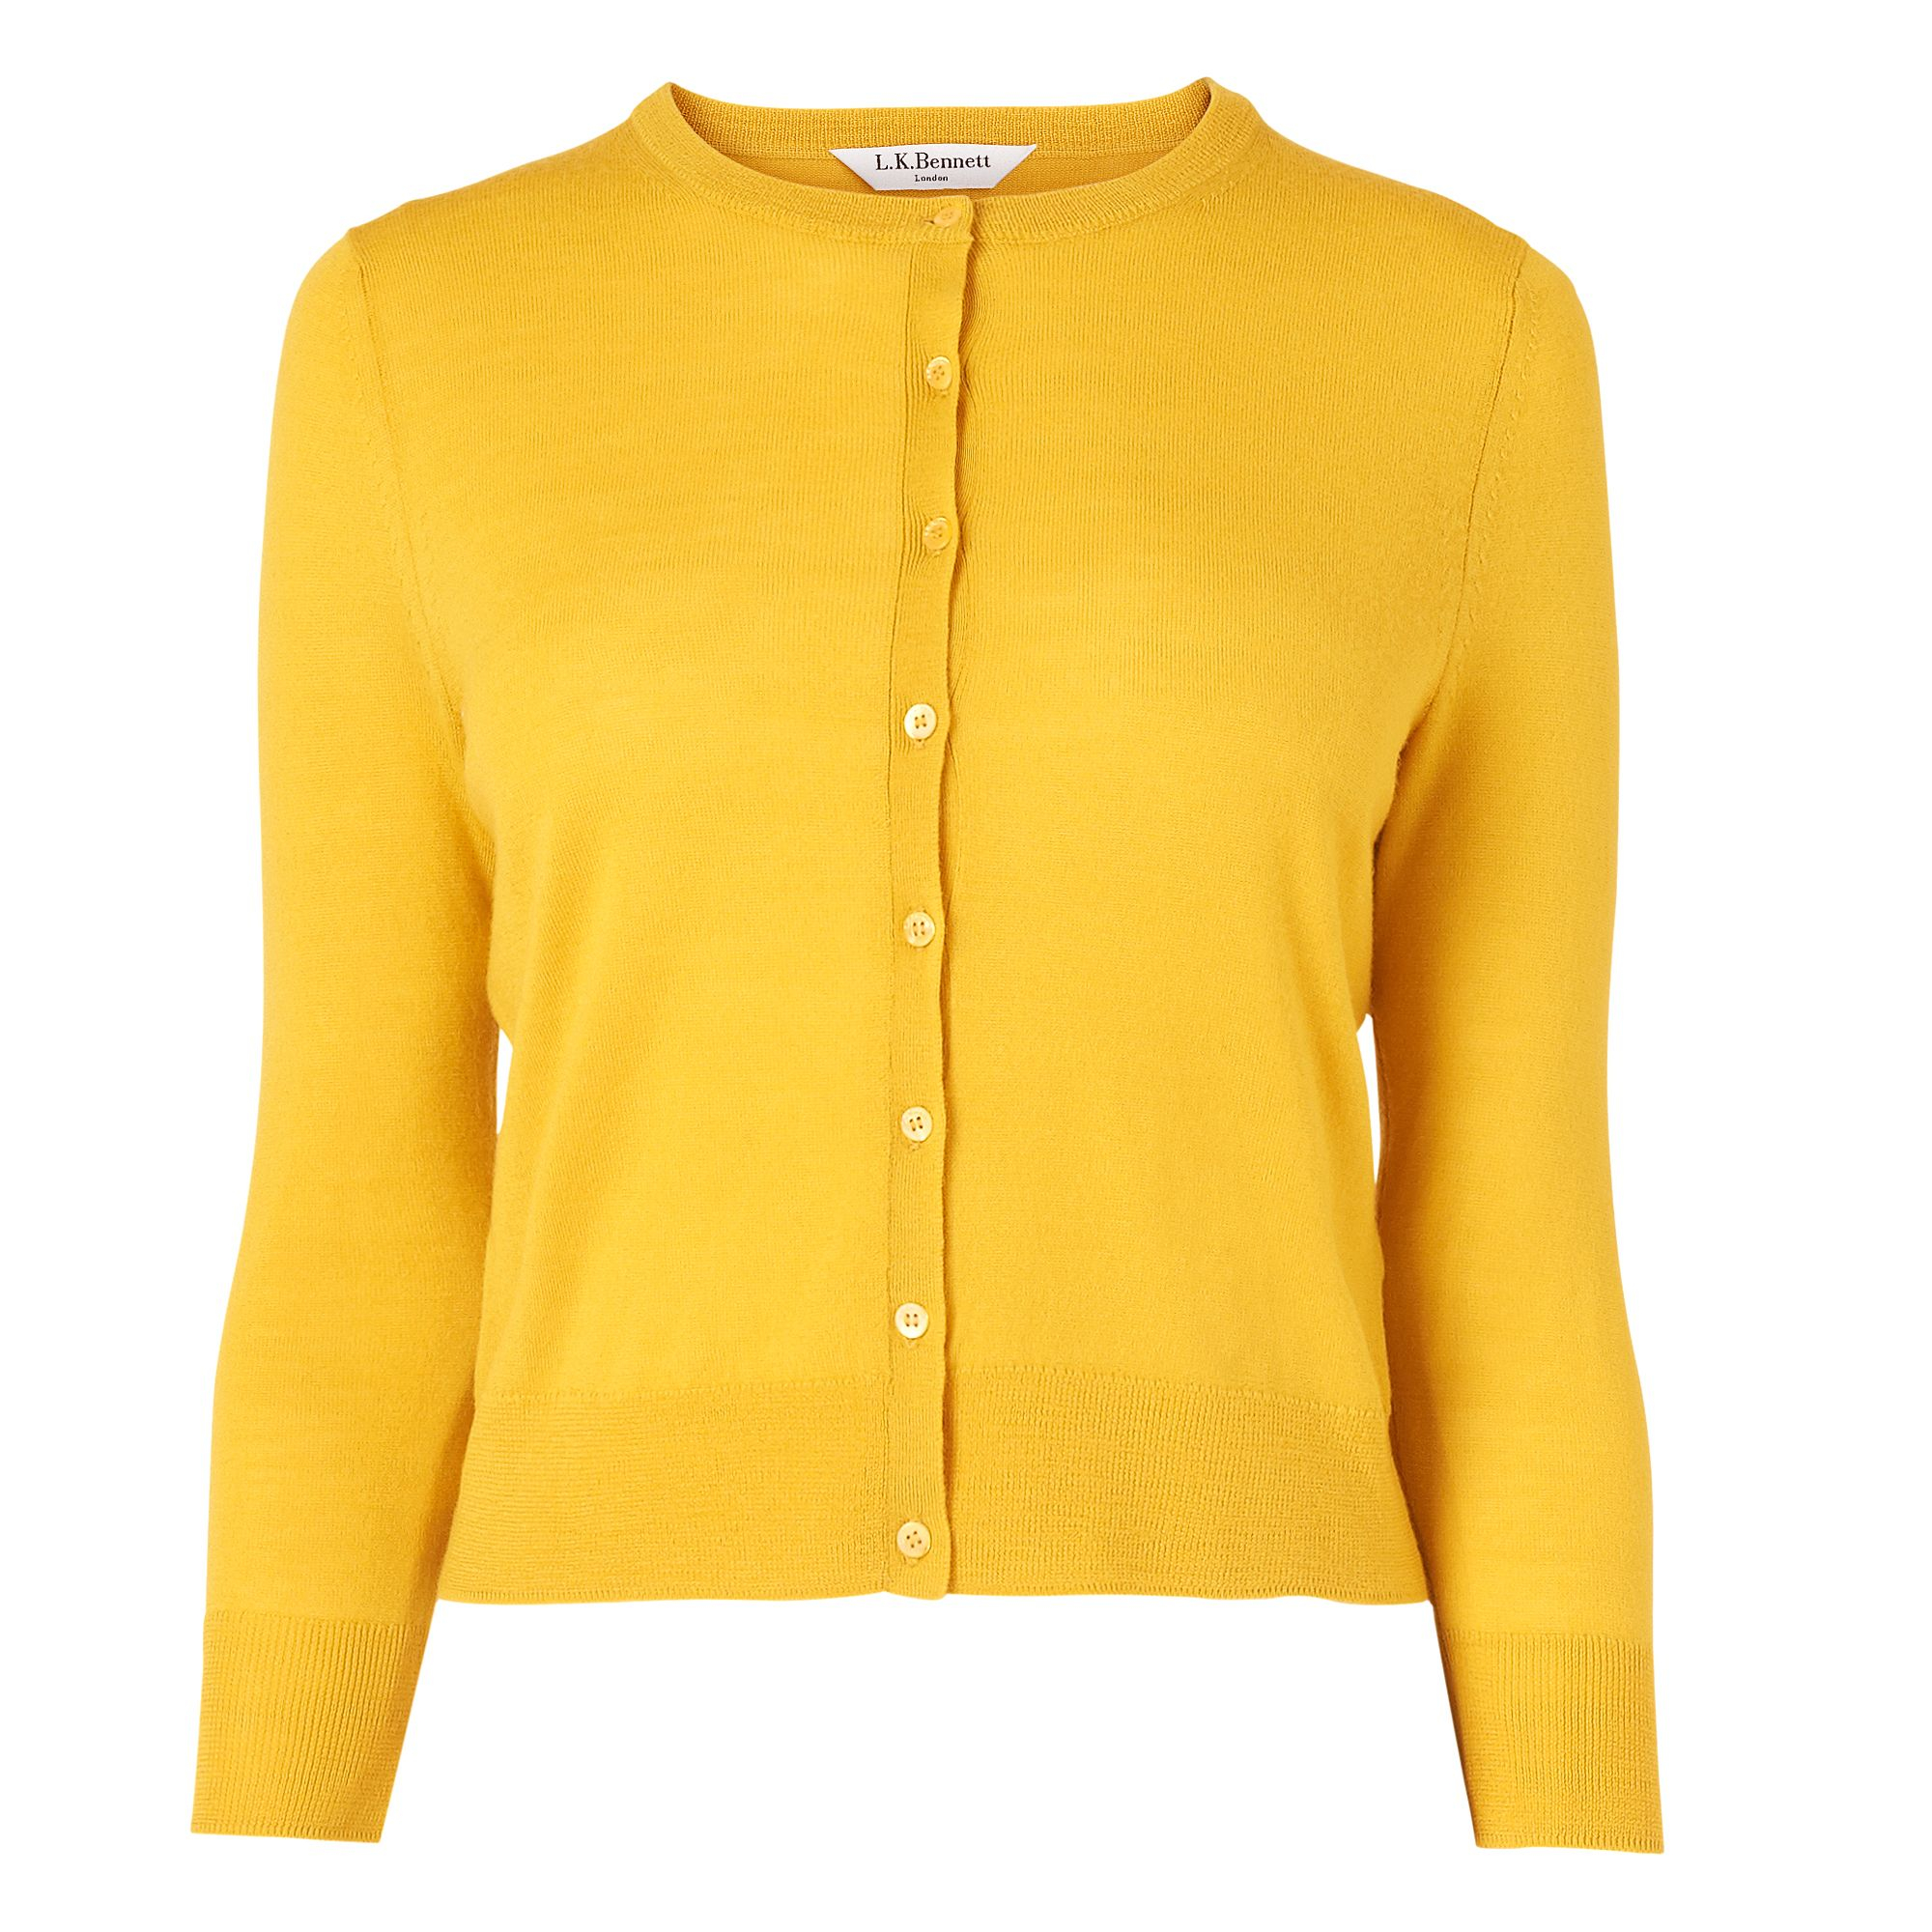 L.k.bennett Bonnie Crew Neck Cardigan in Yellow | Lyst